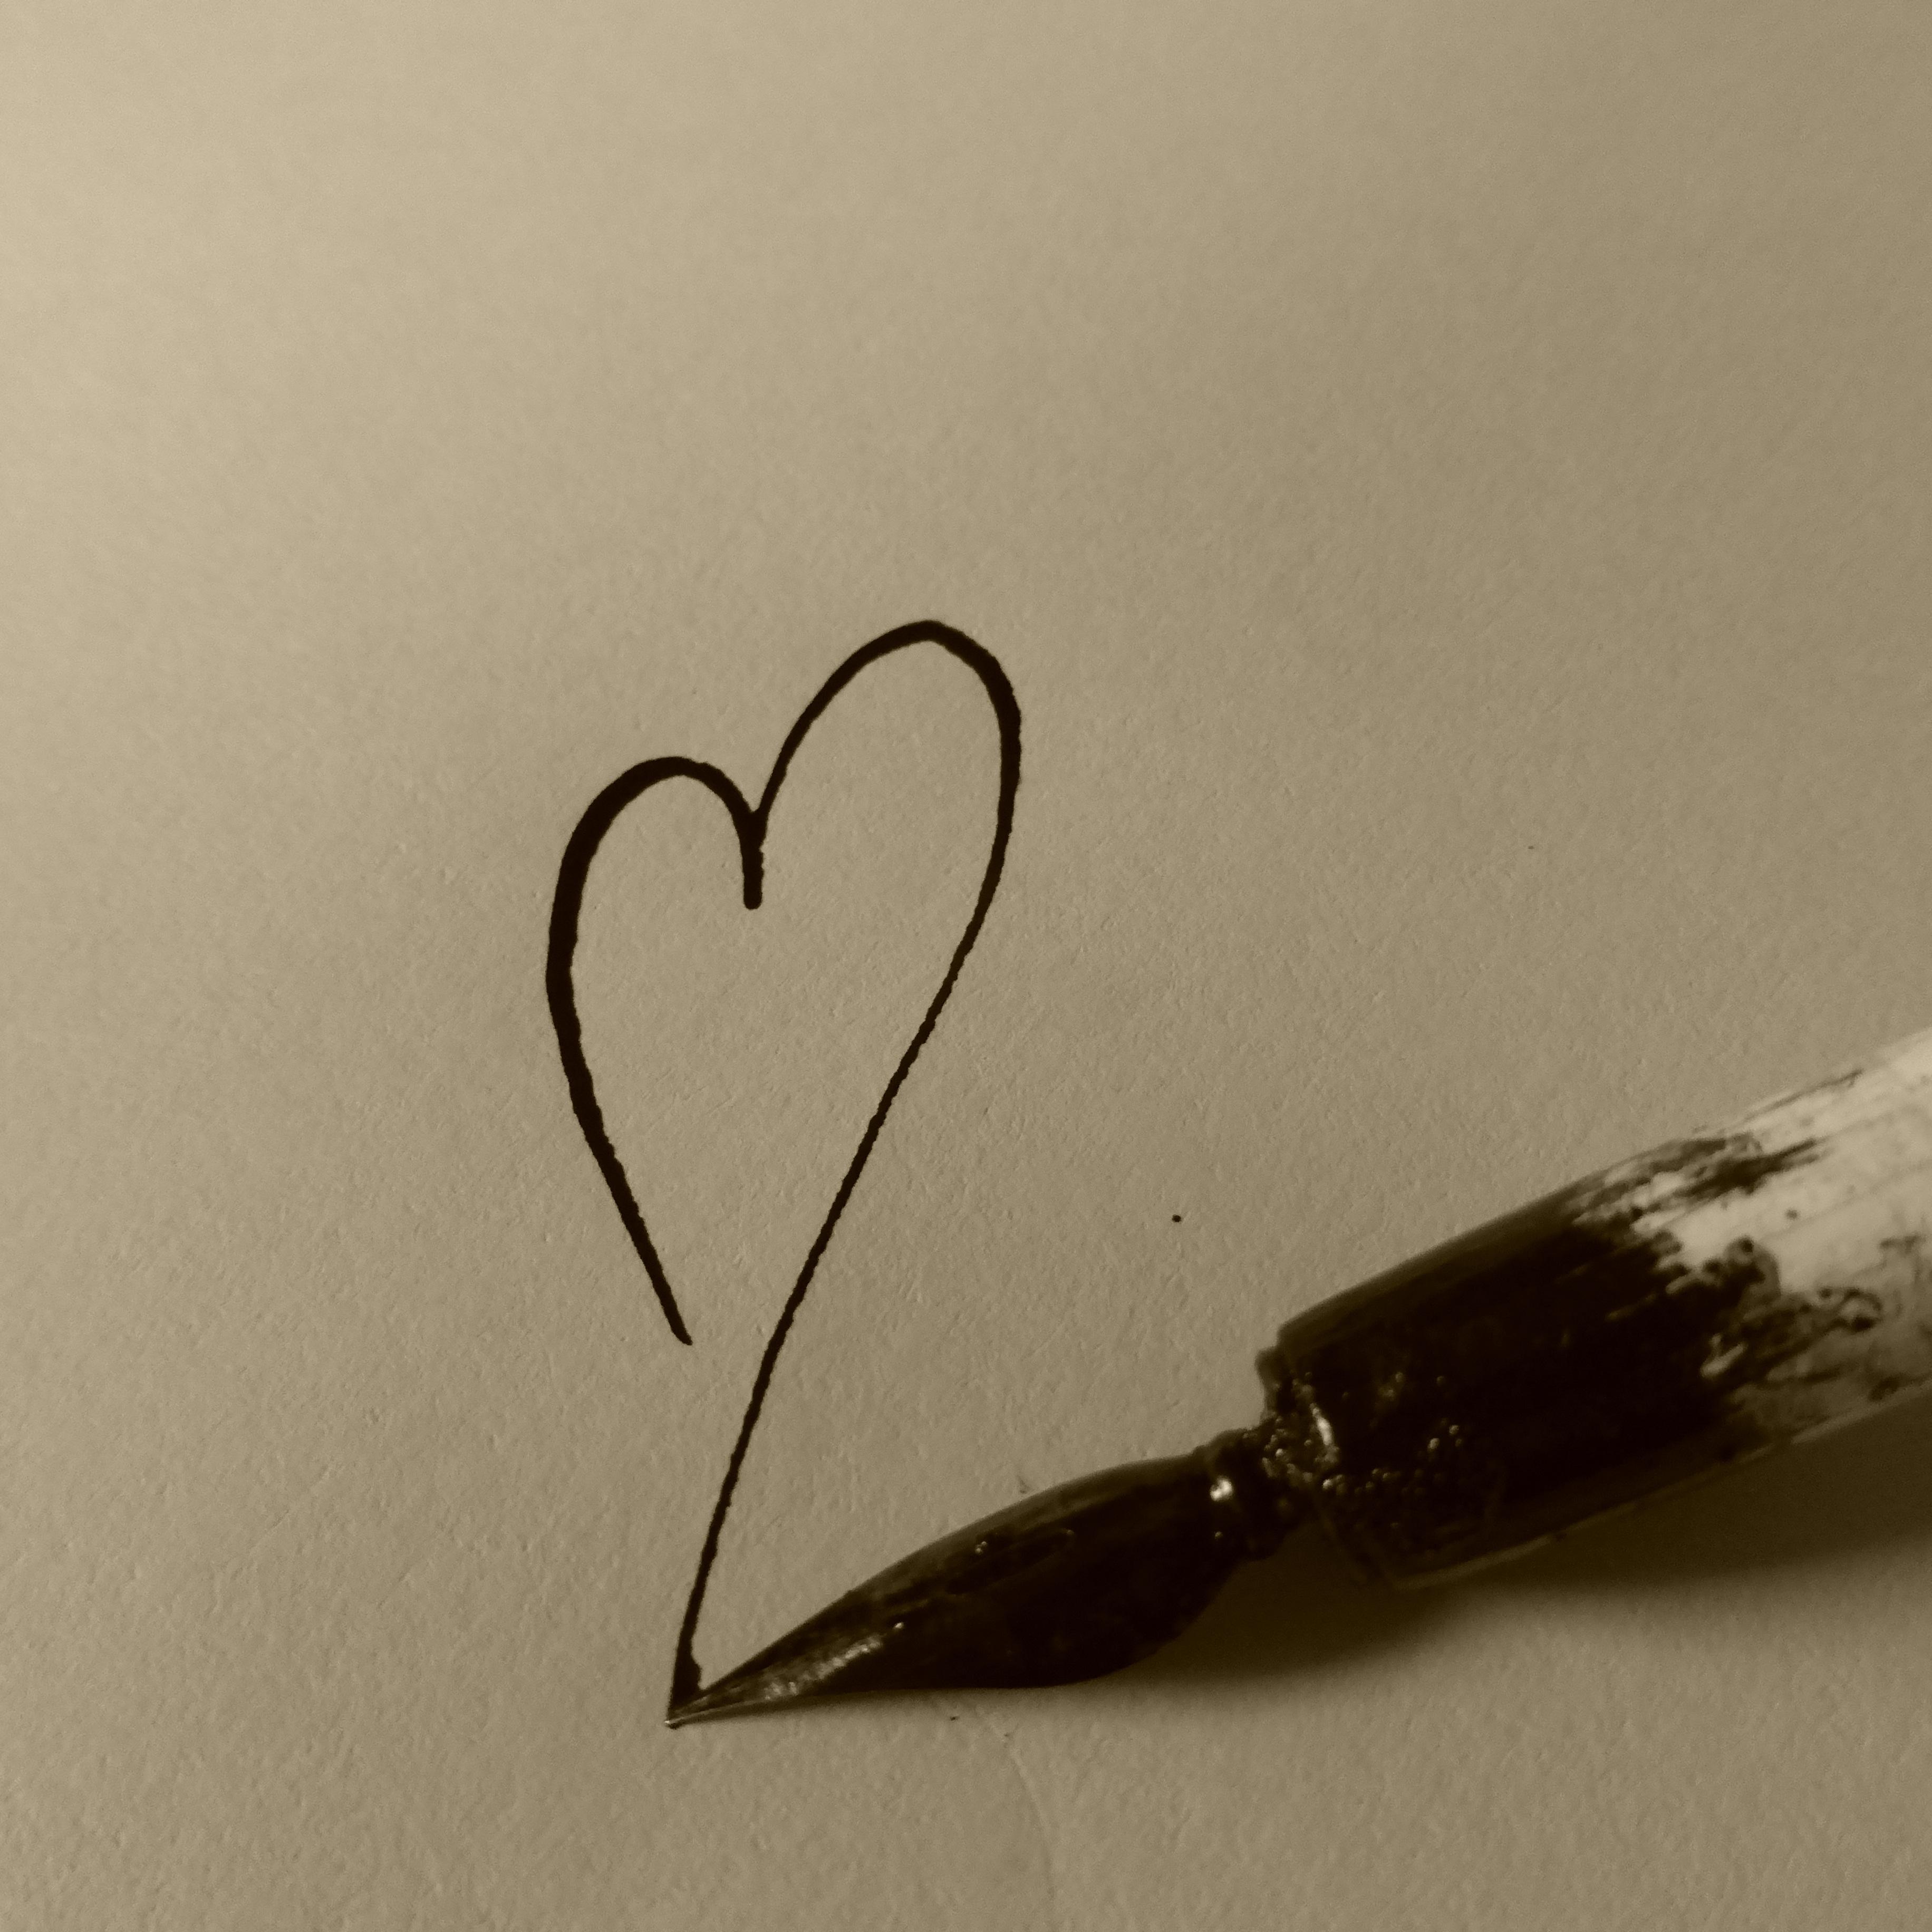 Gambar Penulisan Tangan Putih Cinta Jantung Musim Semi